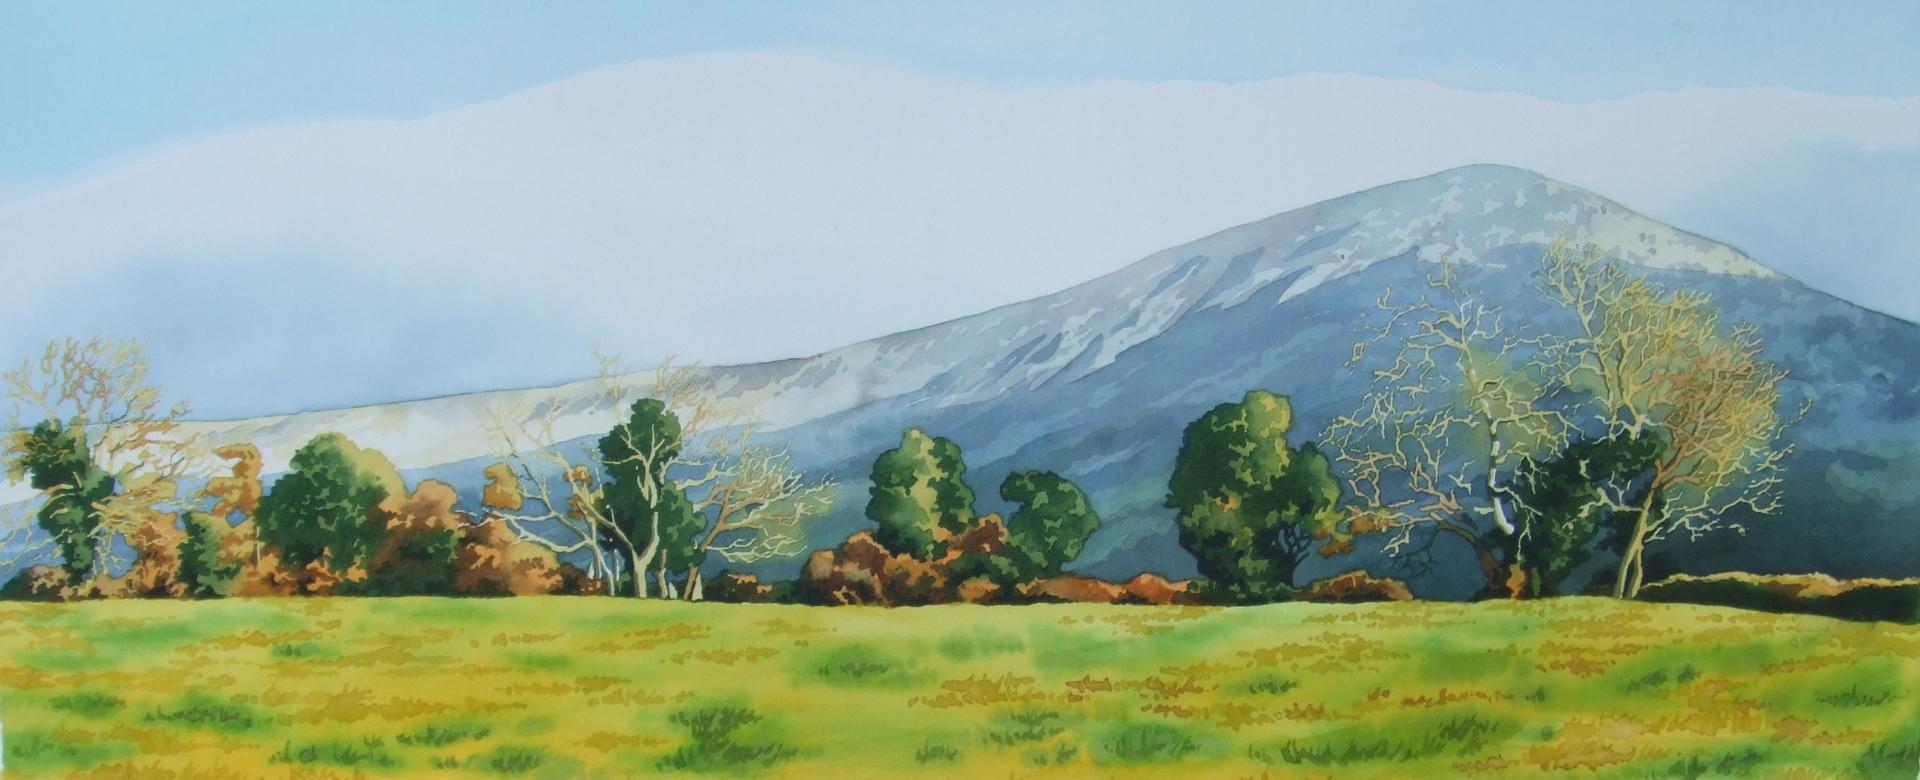 Mount Leinster in winter